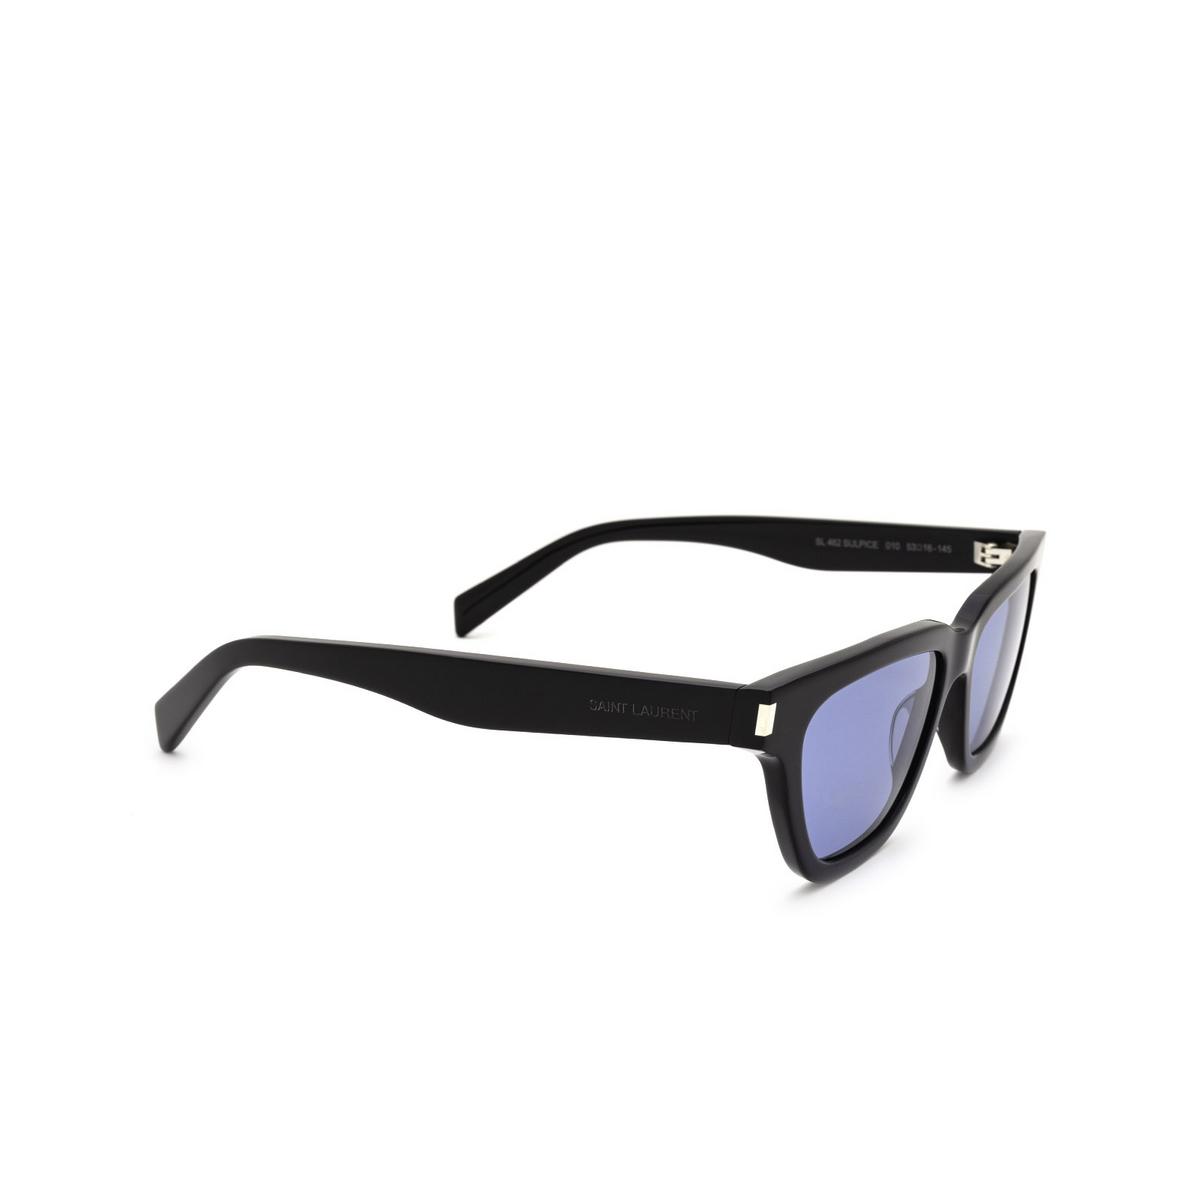 Saint Laurent® Cat-eye Sunglasses: Sulpice SL 462 color Black 010 - three-quarters view.